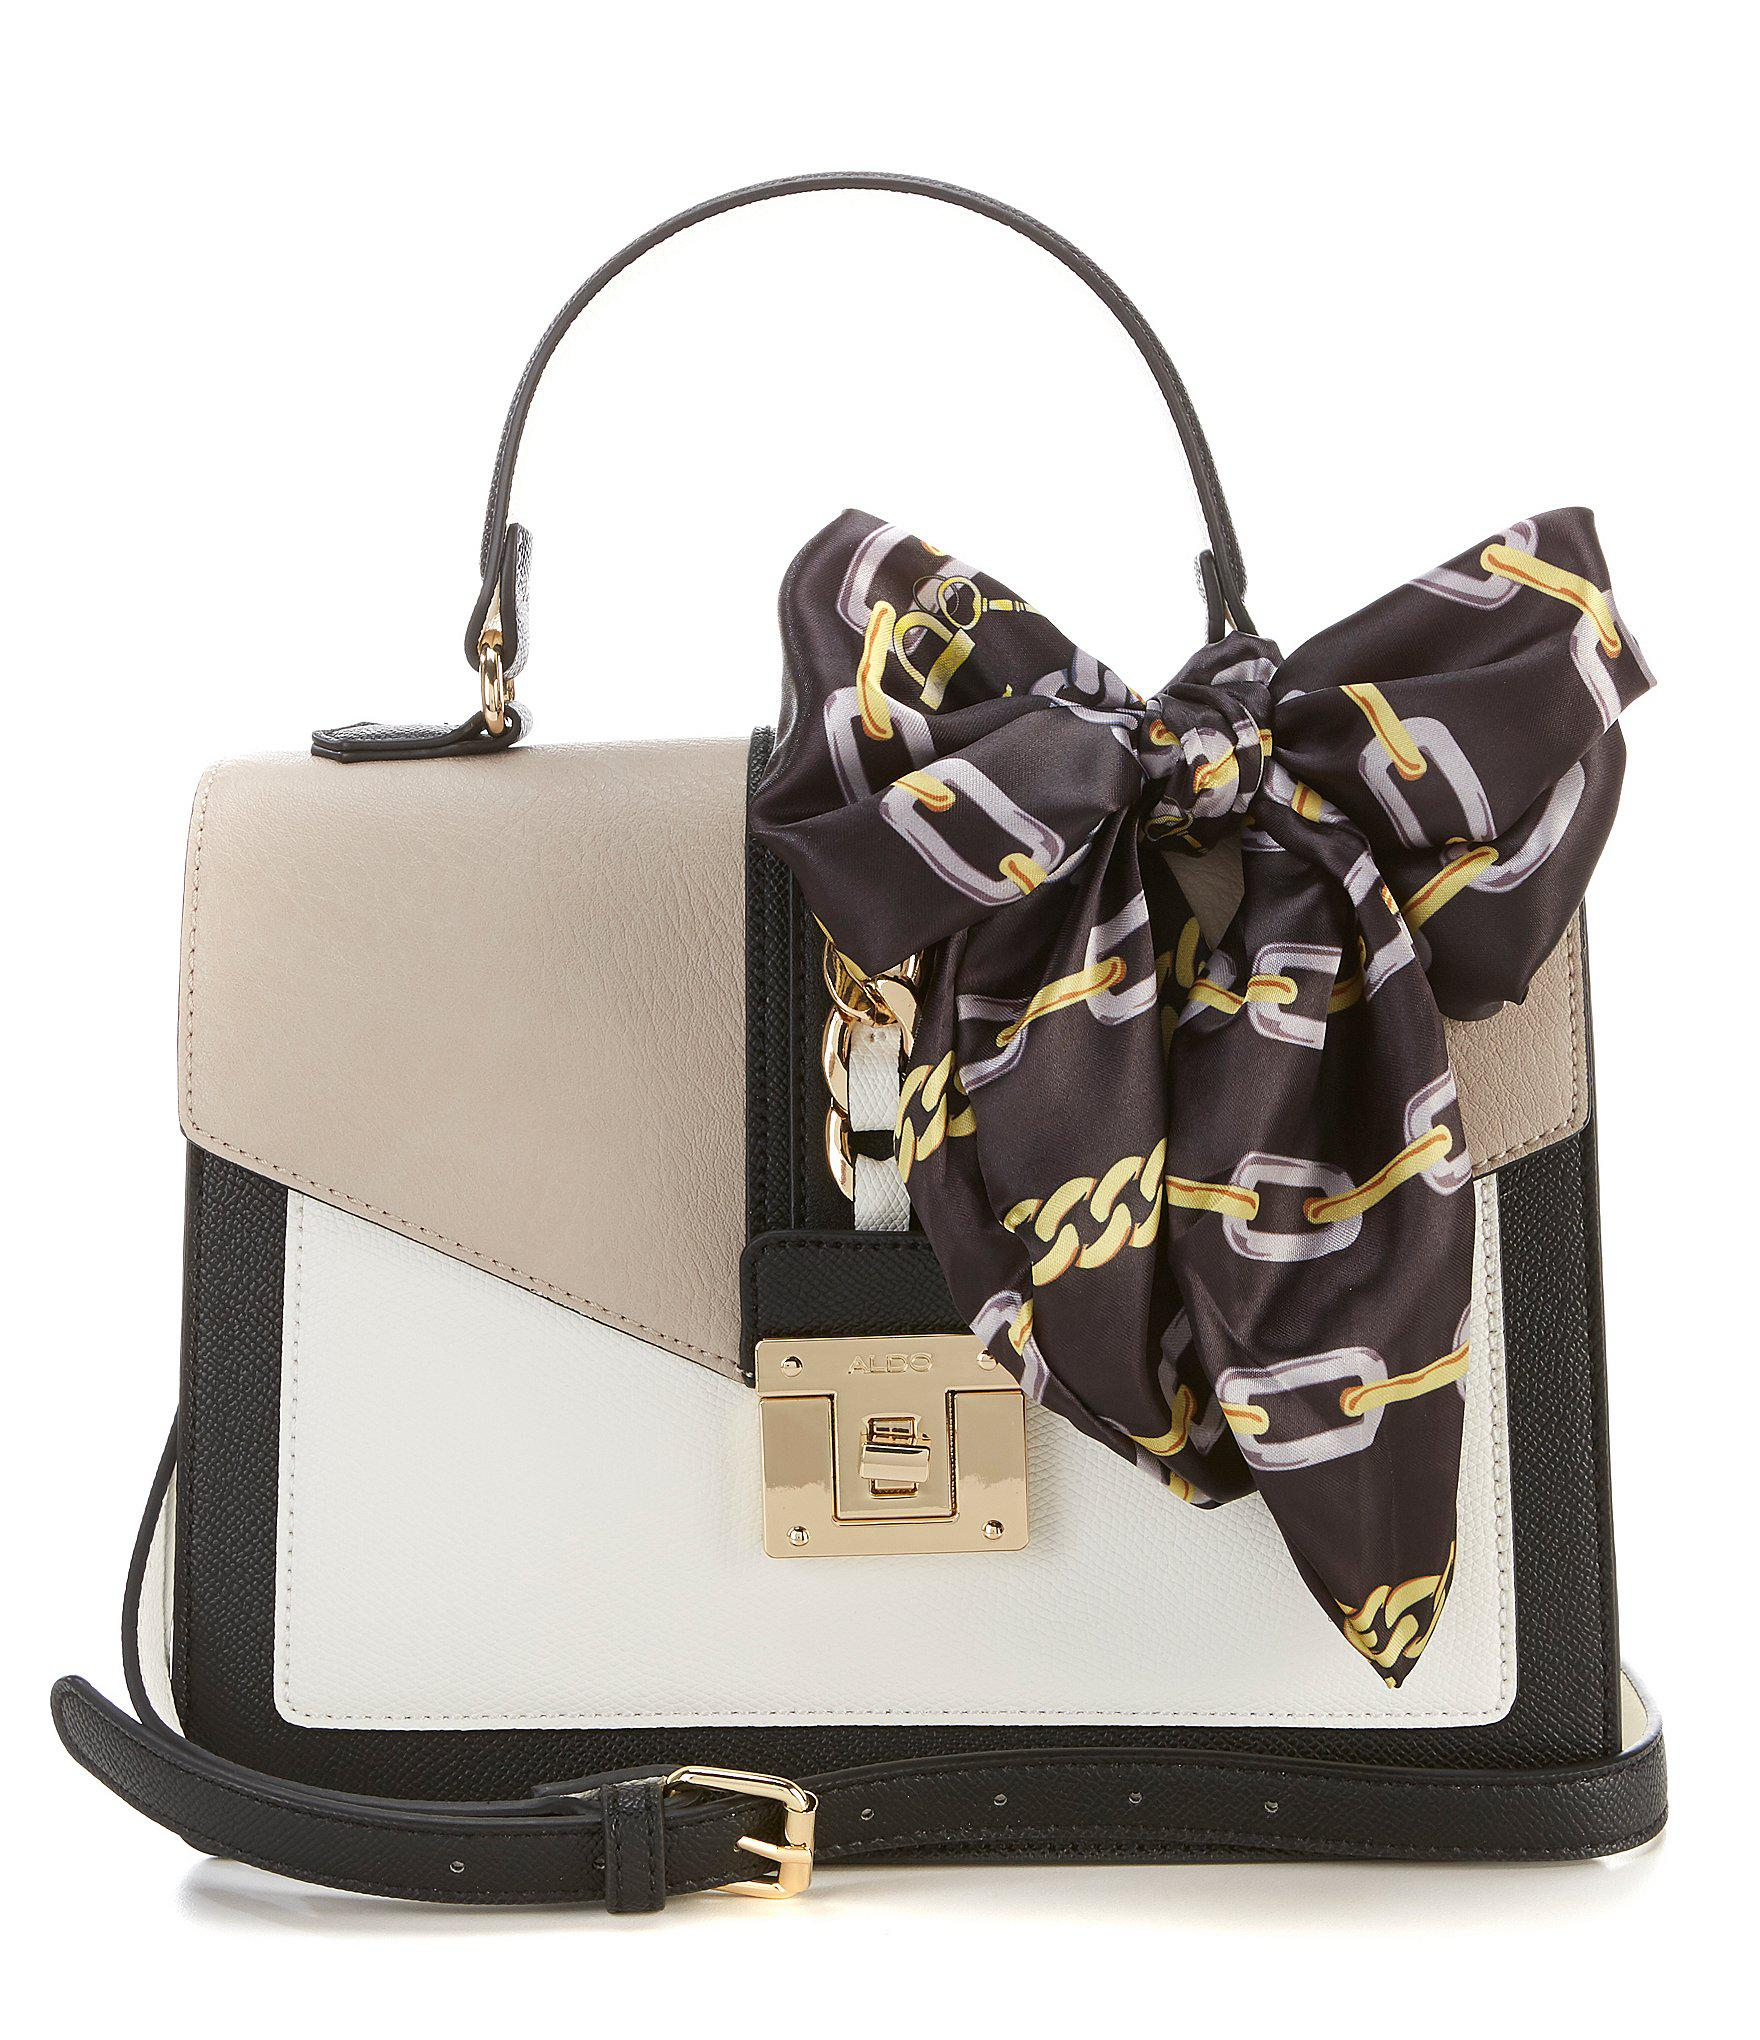 f7e9b787aaa Lyst - ALDO Glendaa Small Top Handle Taupe Colorblock Handbag